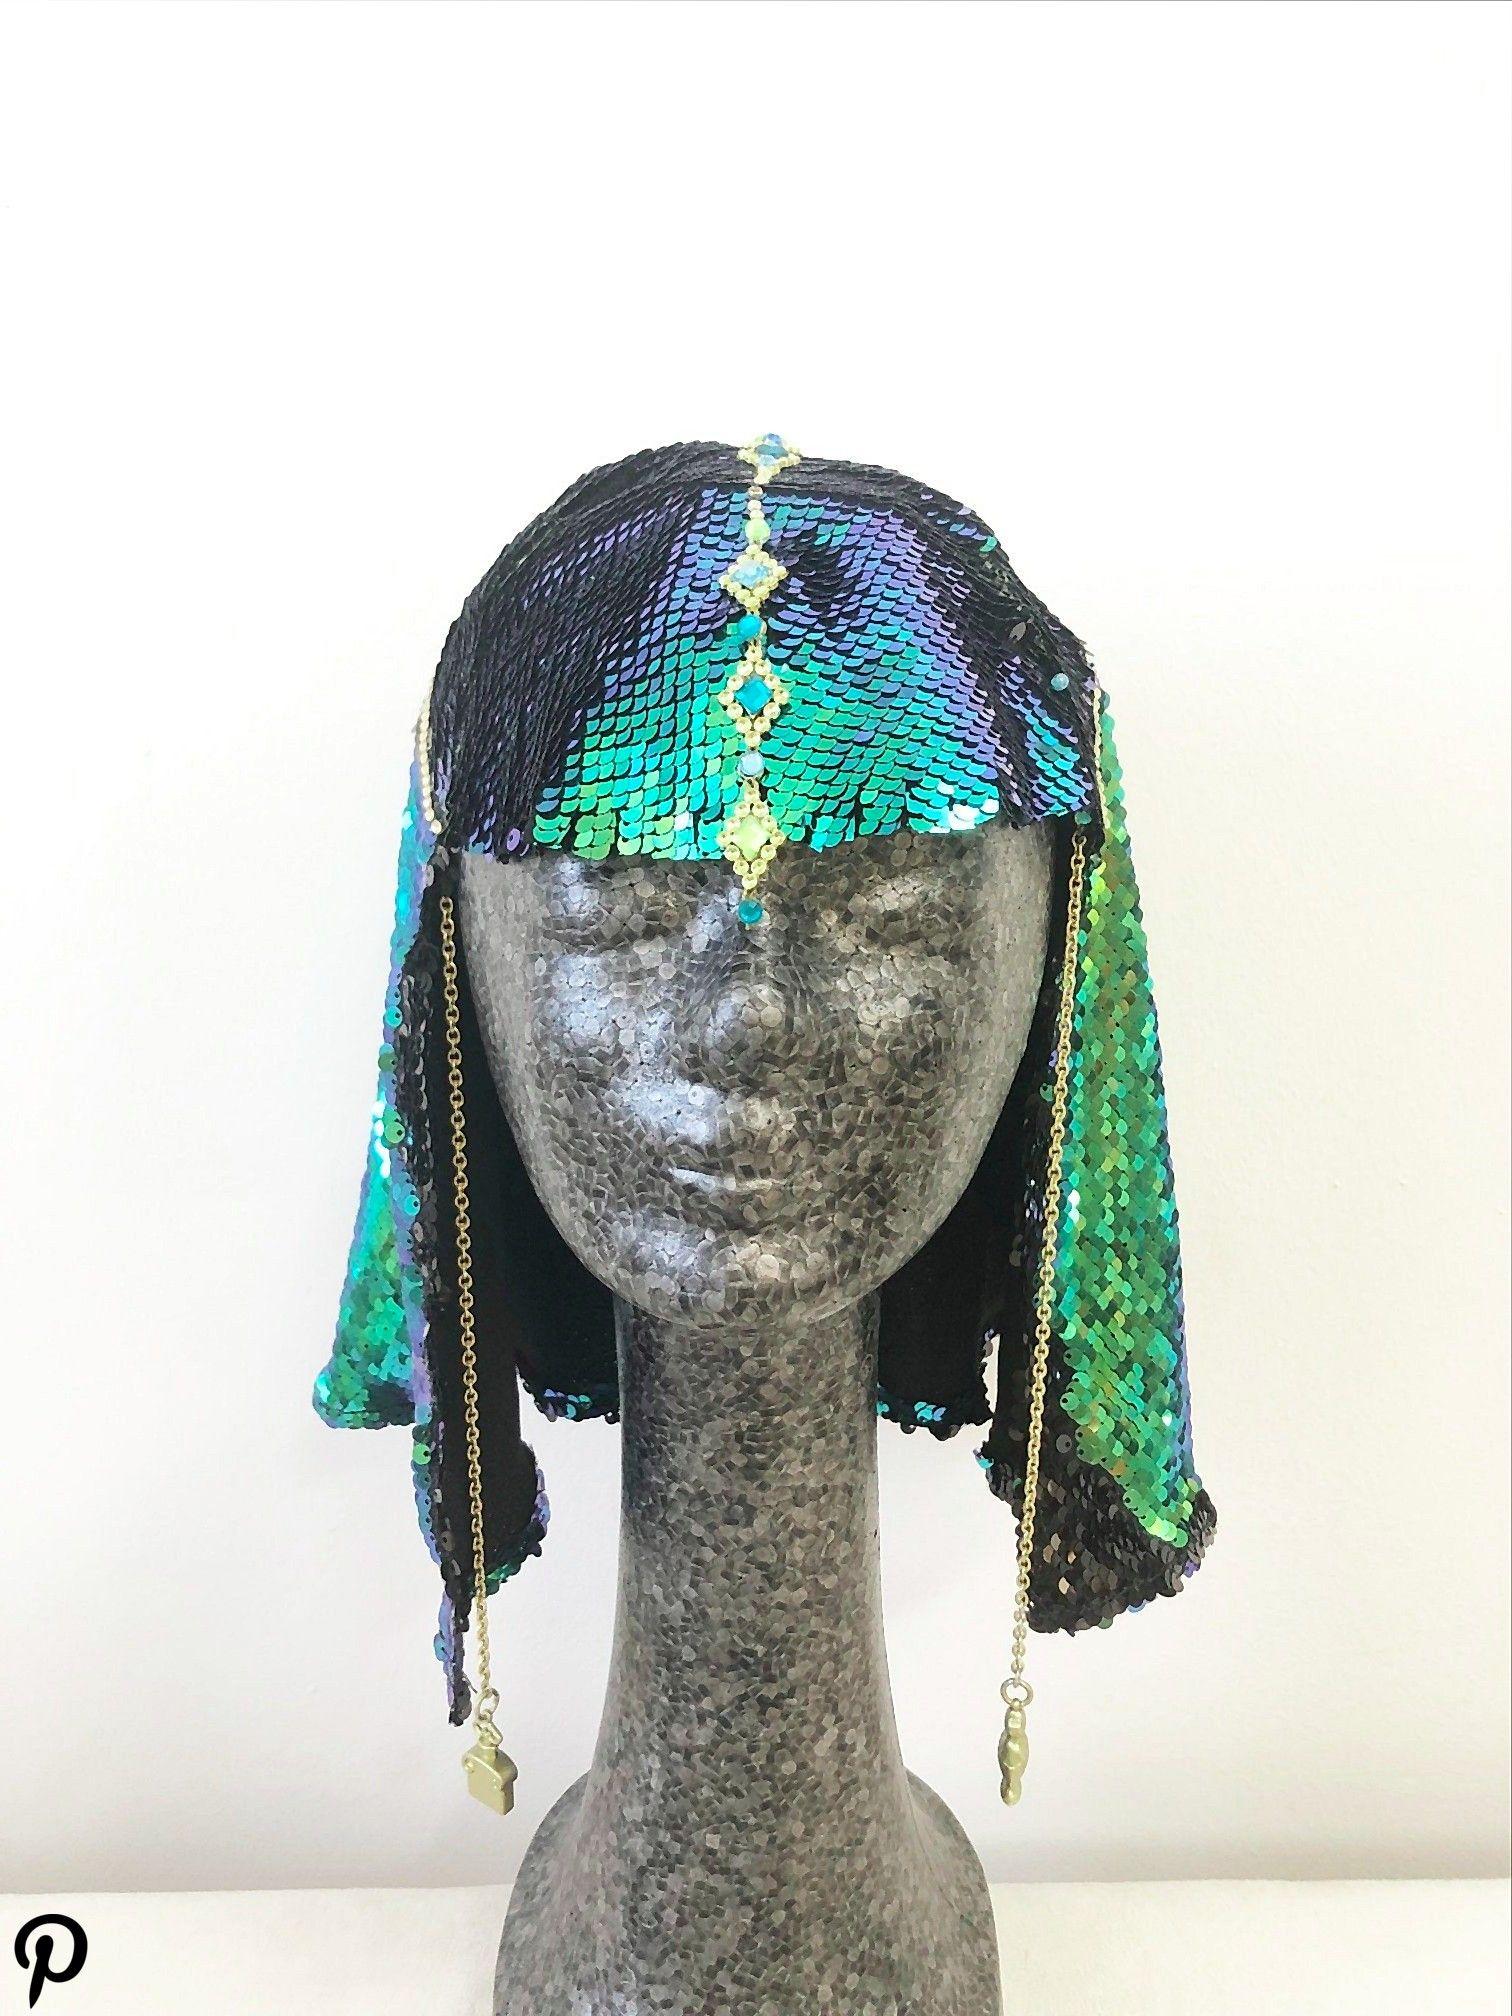 wig headpiece mermaid sphinx onesize festival clothes headdress Burningman wig headpiece mermaid sphinx onesize festival clothes headdress Burningman